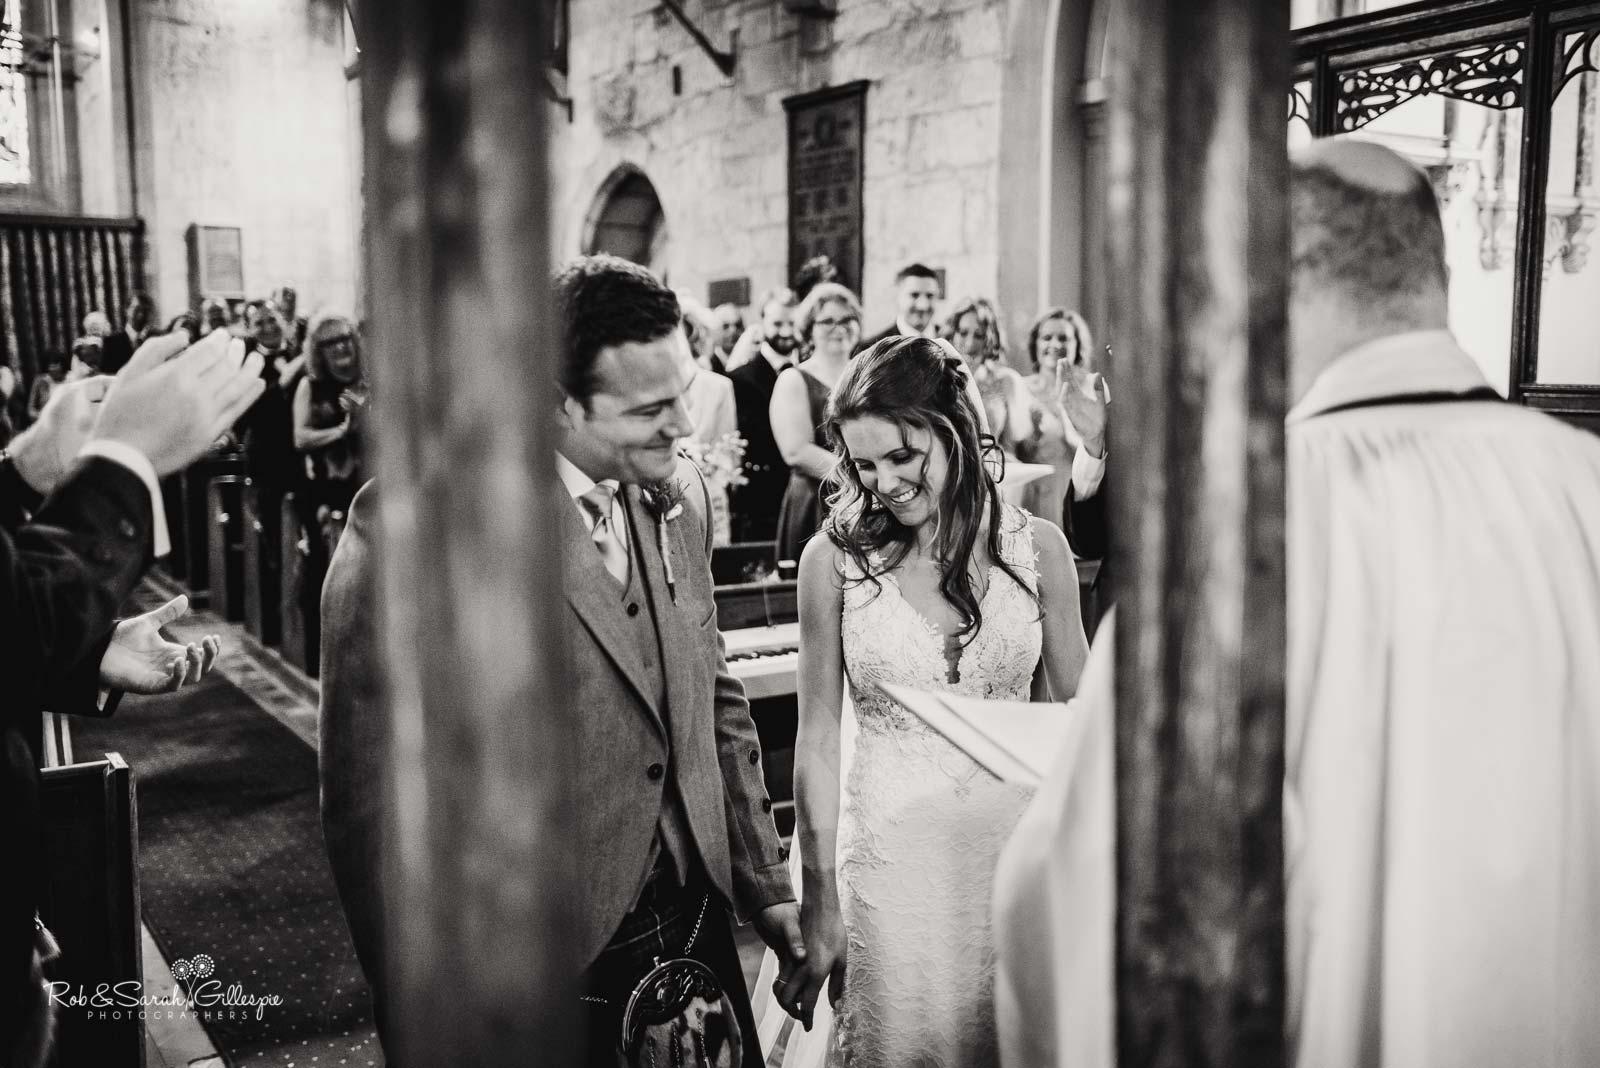 Wedding at St Giles church Packwood